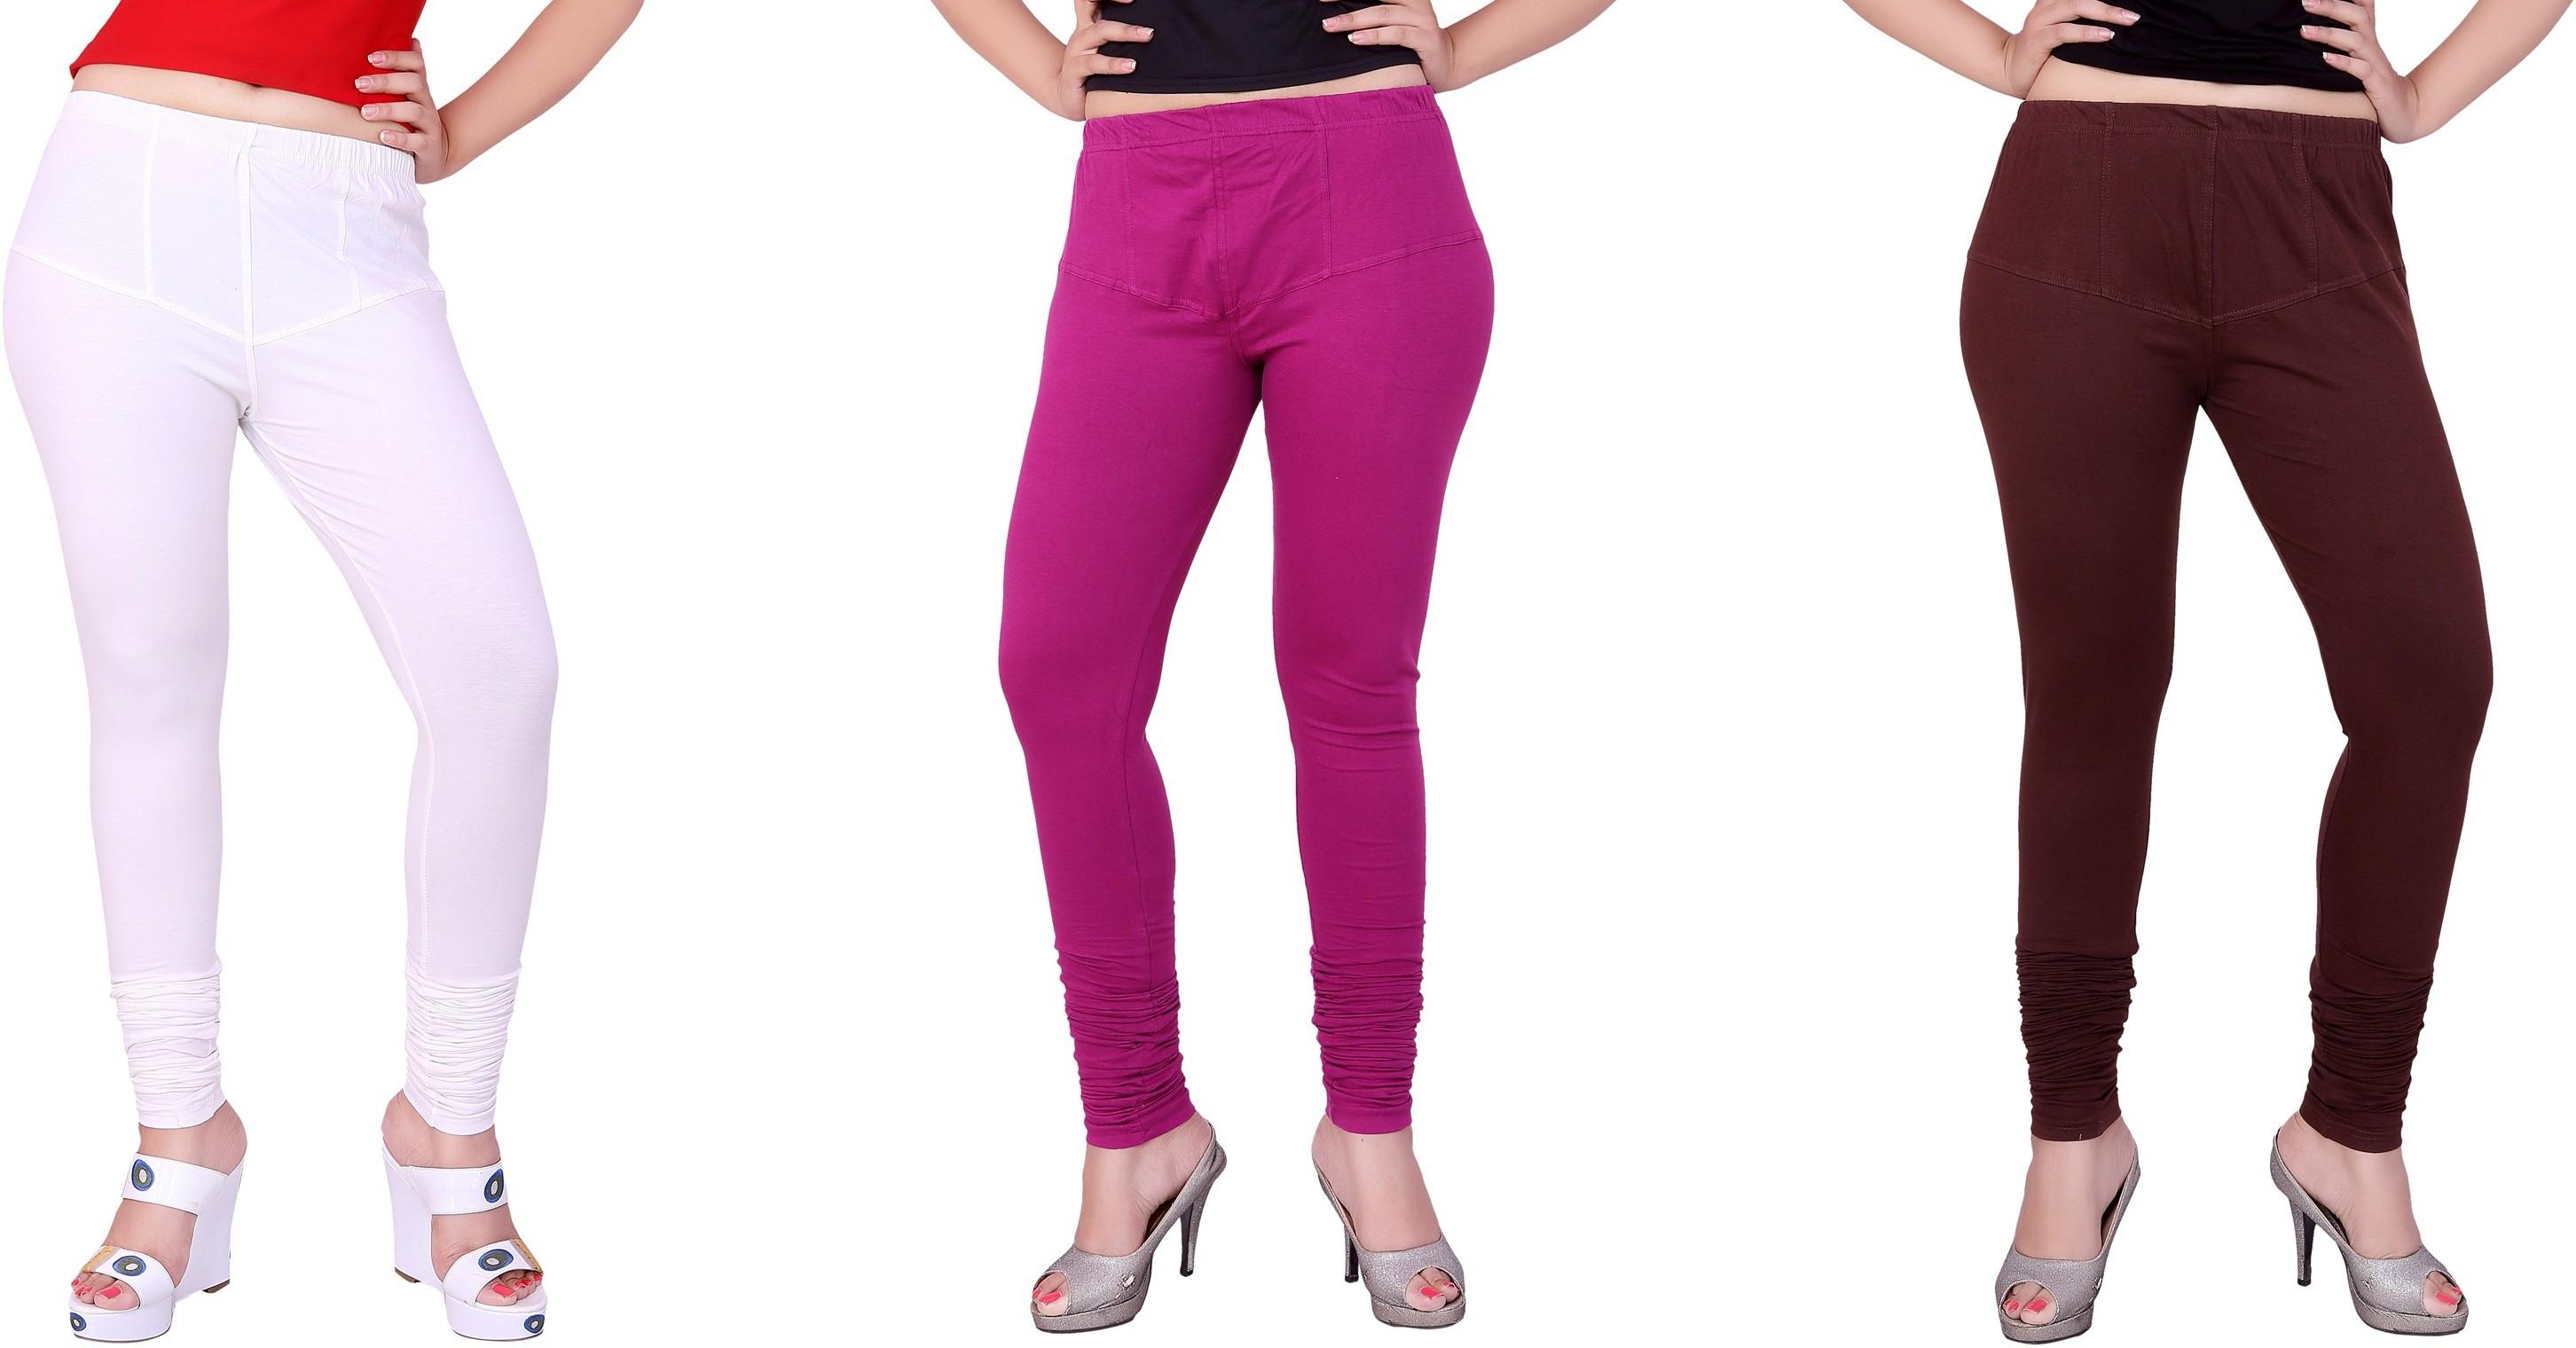 Fck3 Womens White, Brown, Purple Leggings(Pack of 3)